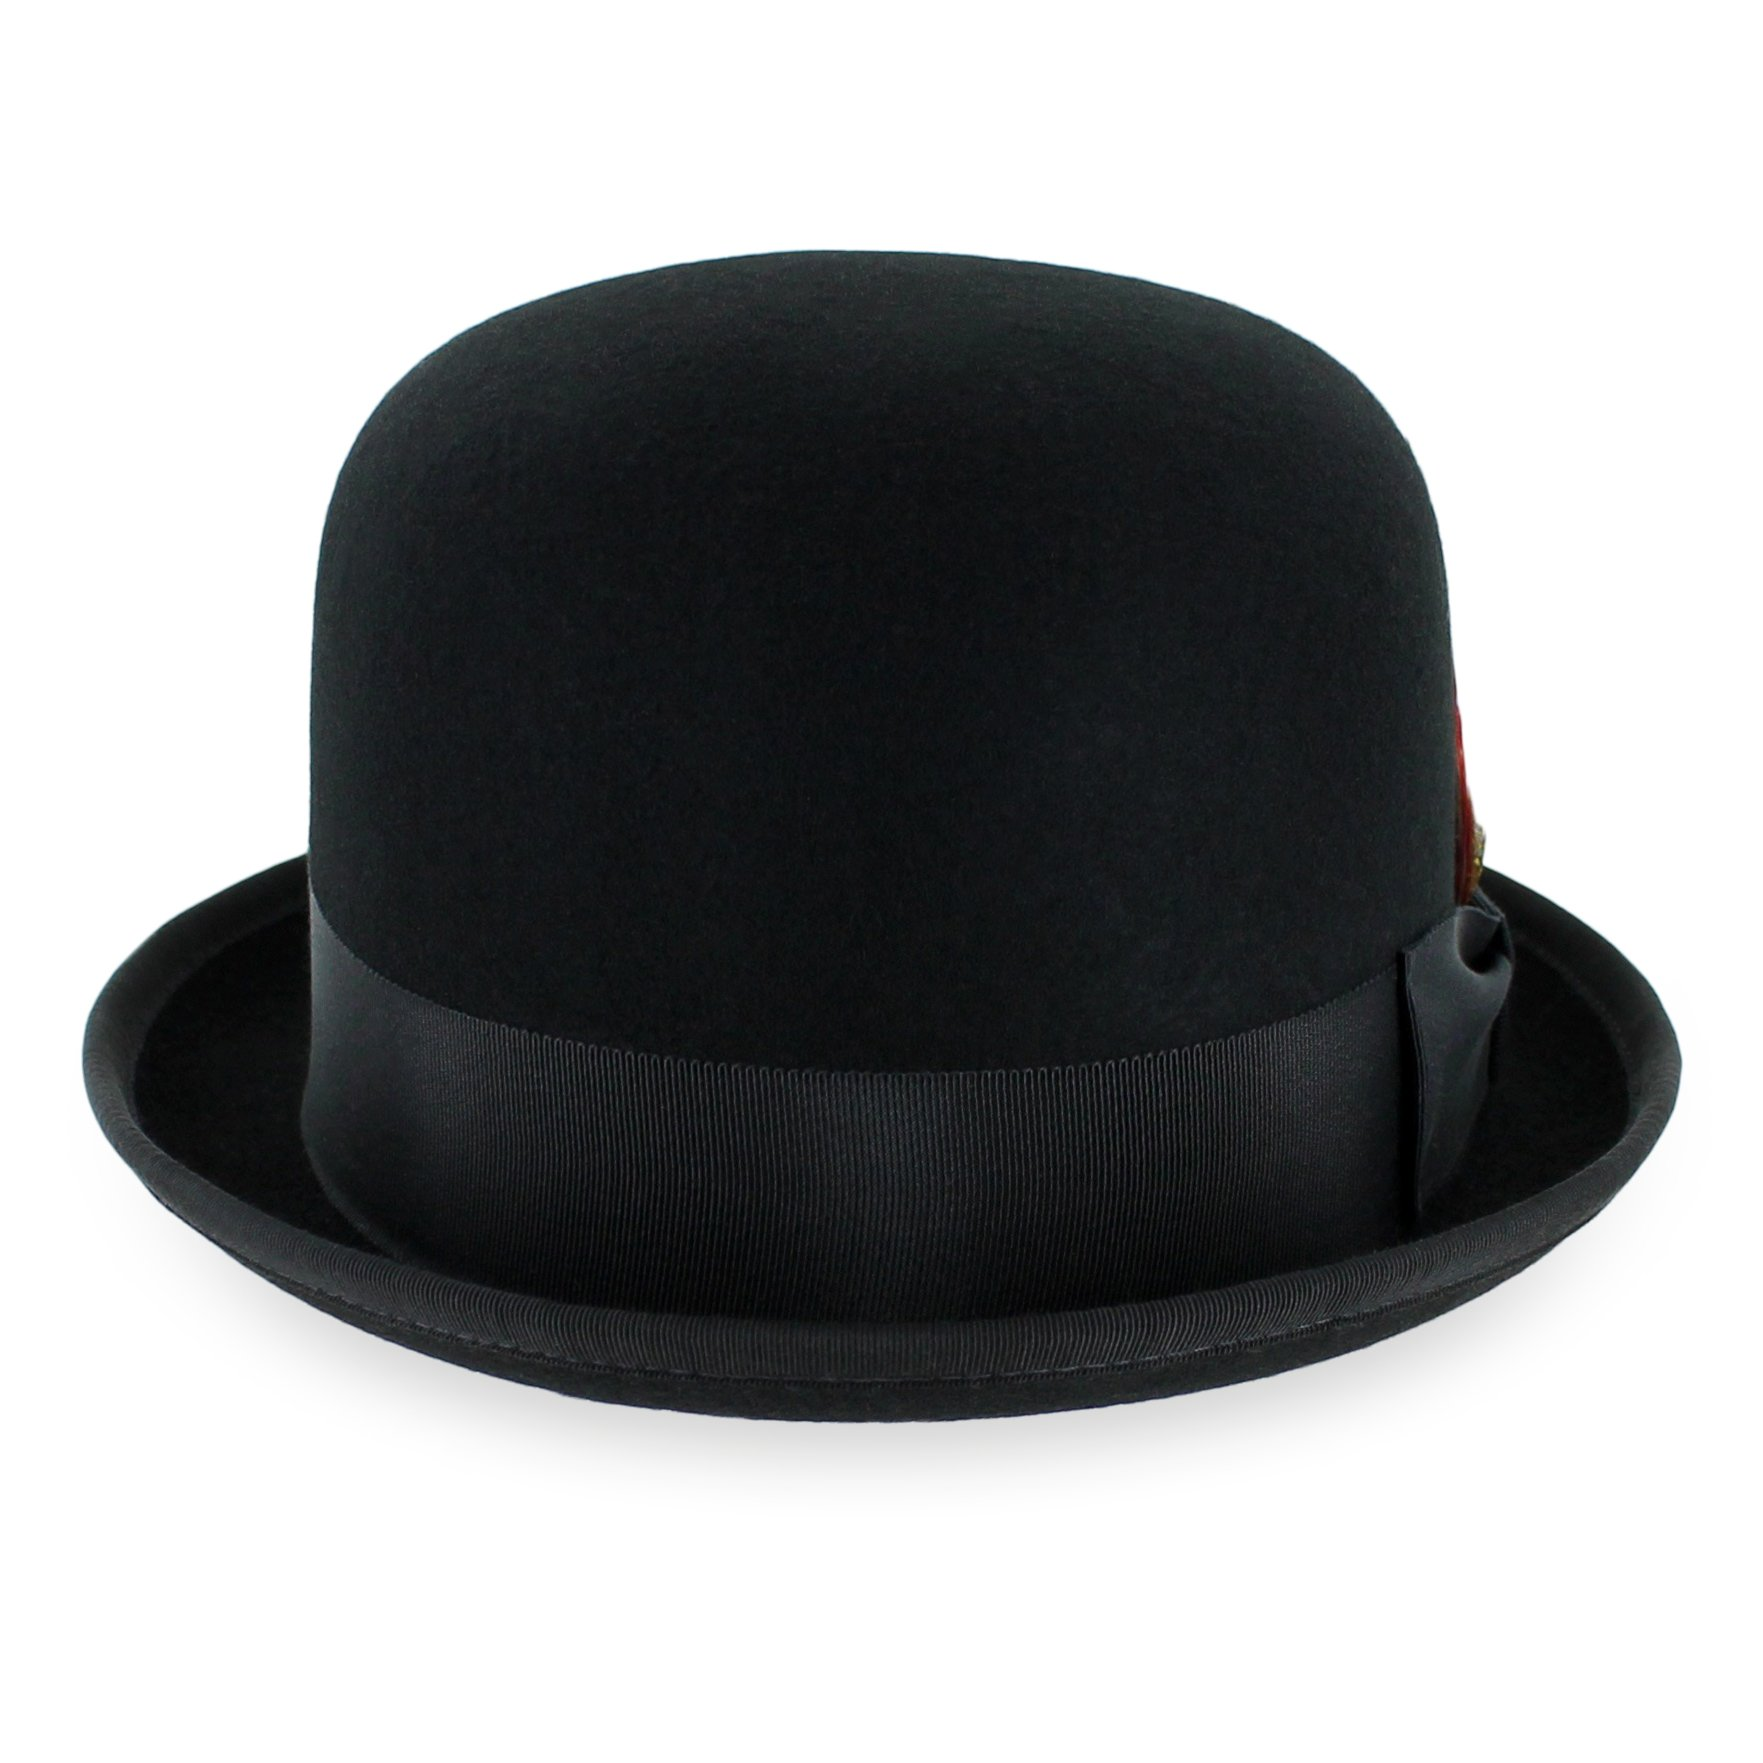 Belfry Deuce 100% Wool Felt Stingy Brim Men's Derby Bowler Hat in 4 Sizes and 2 Colors X-Large Black